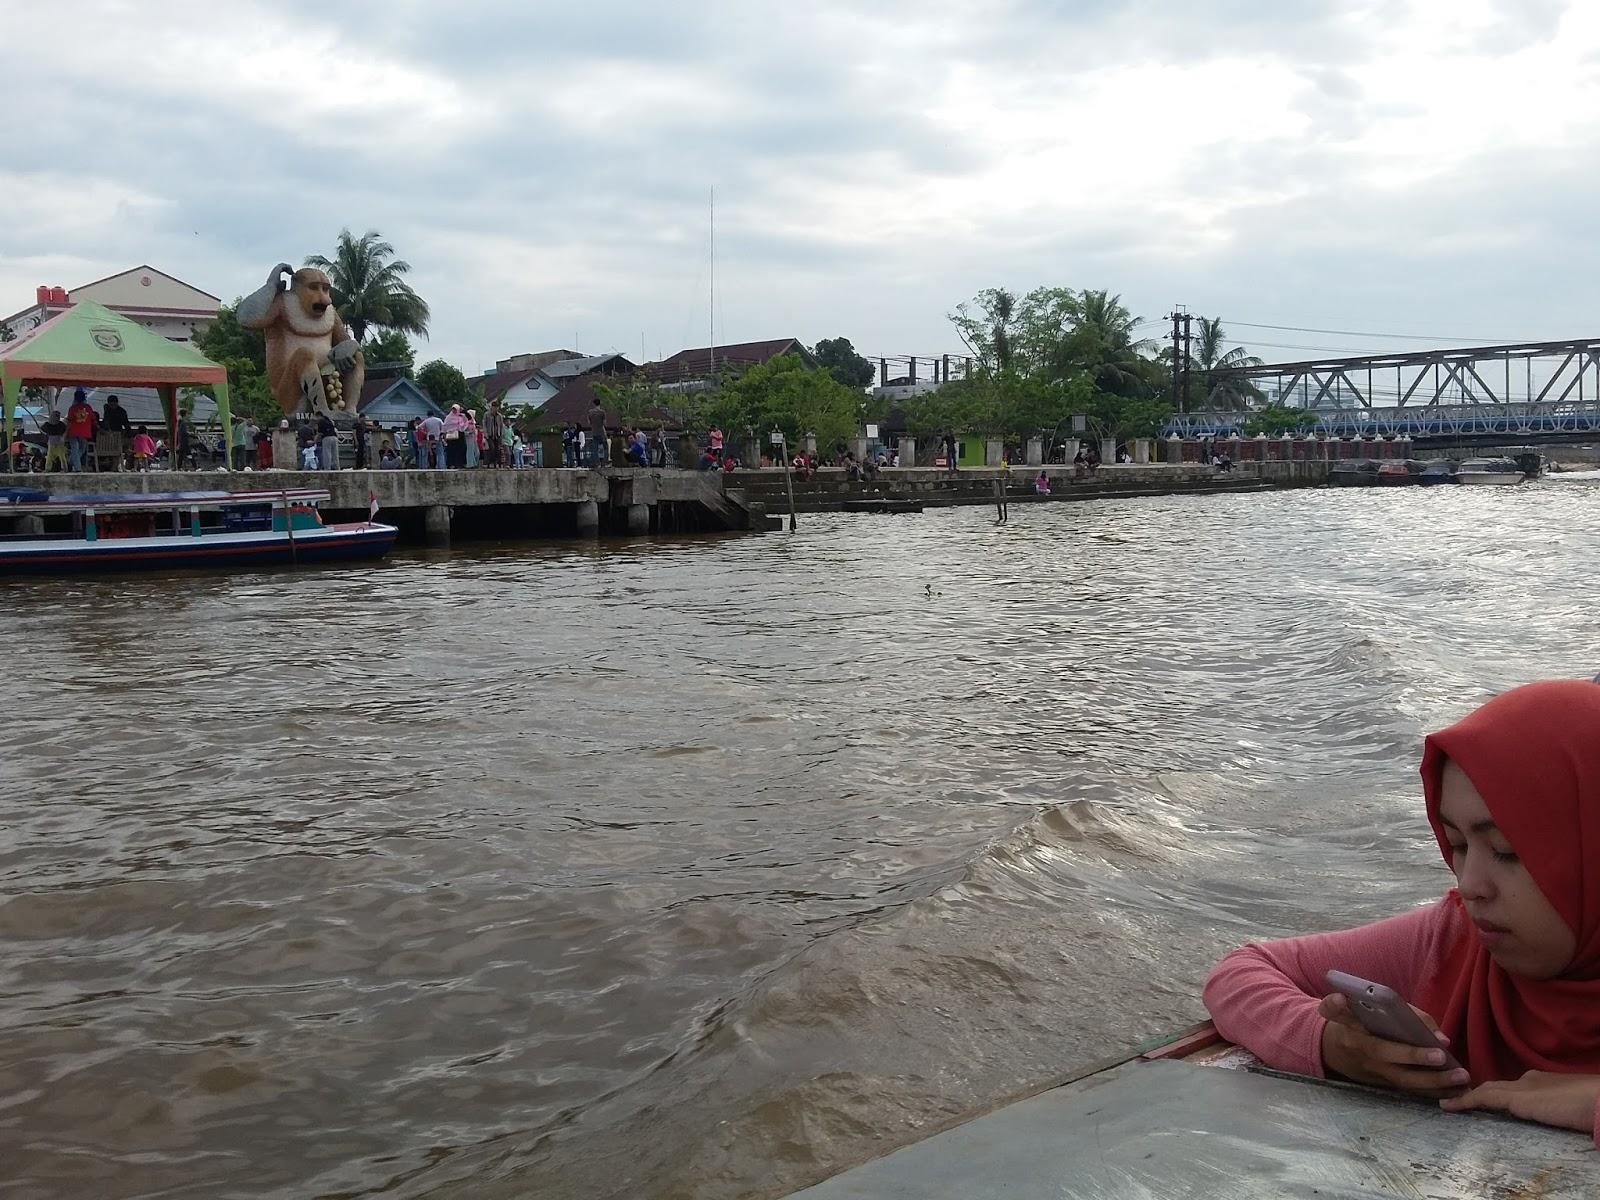 Pasar Terapung Siring Kota Banjarmasin Kalimantan Selatan Indonesia Pun Melalui